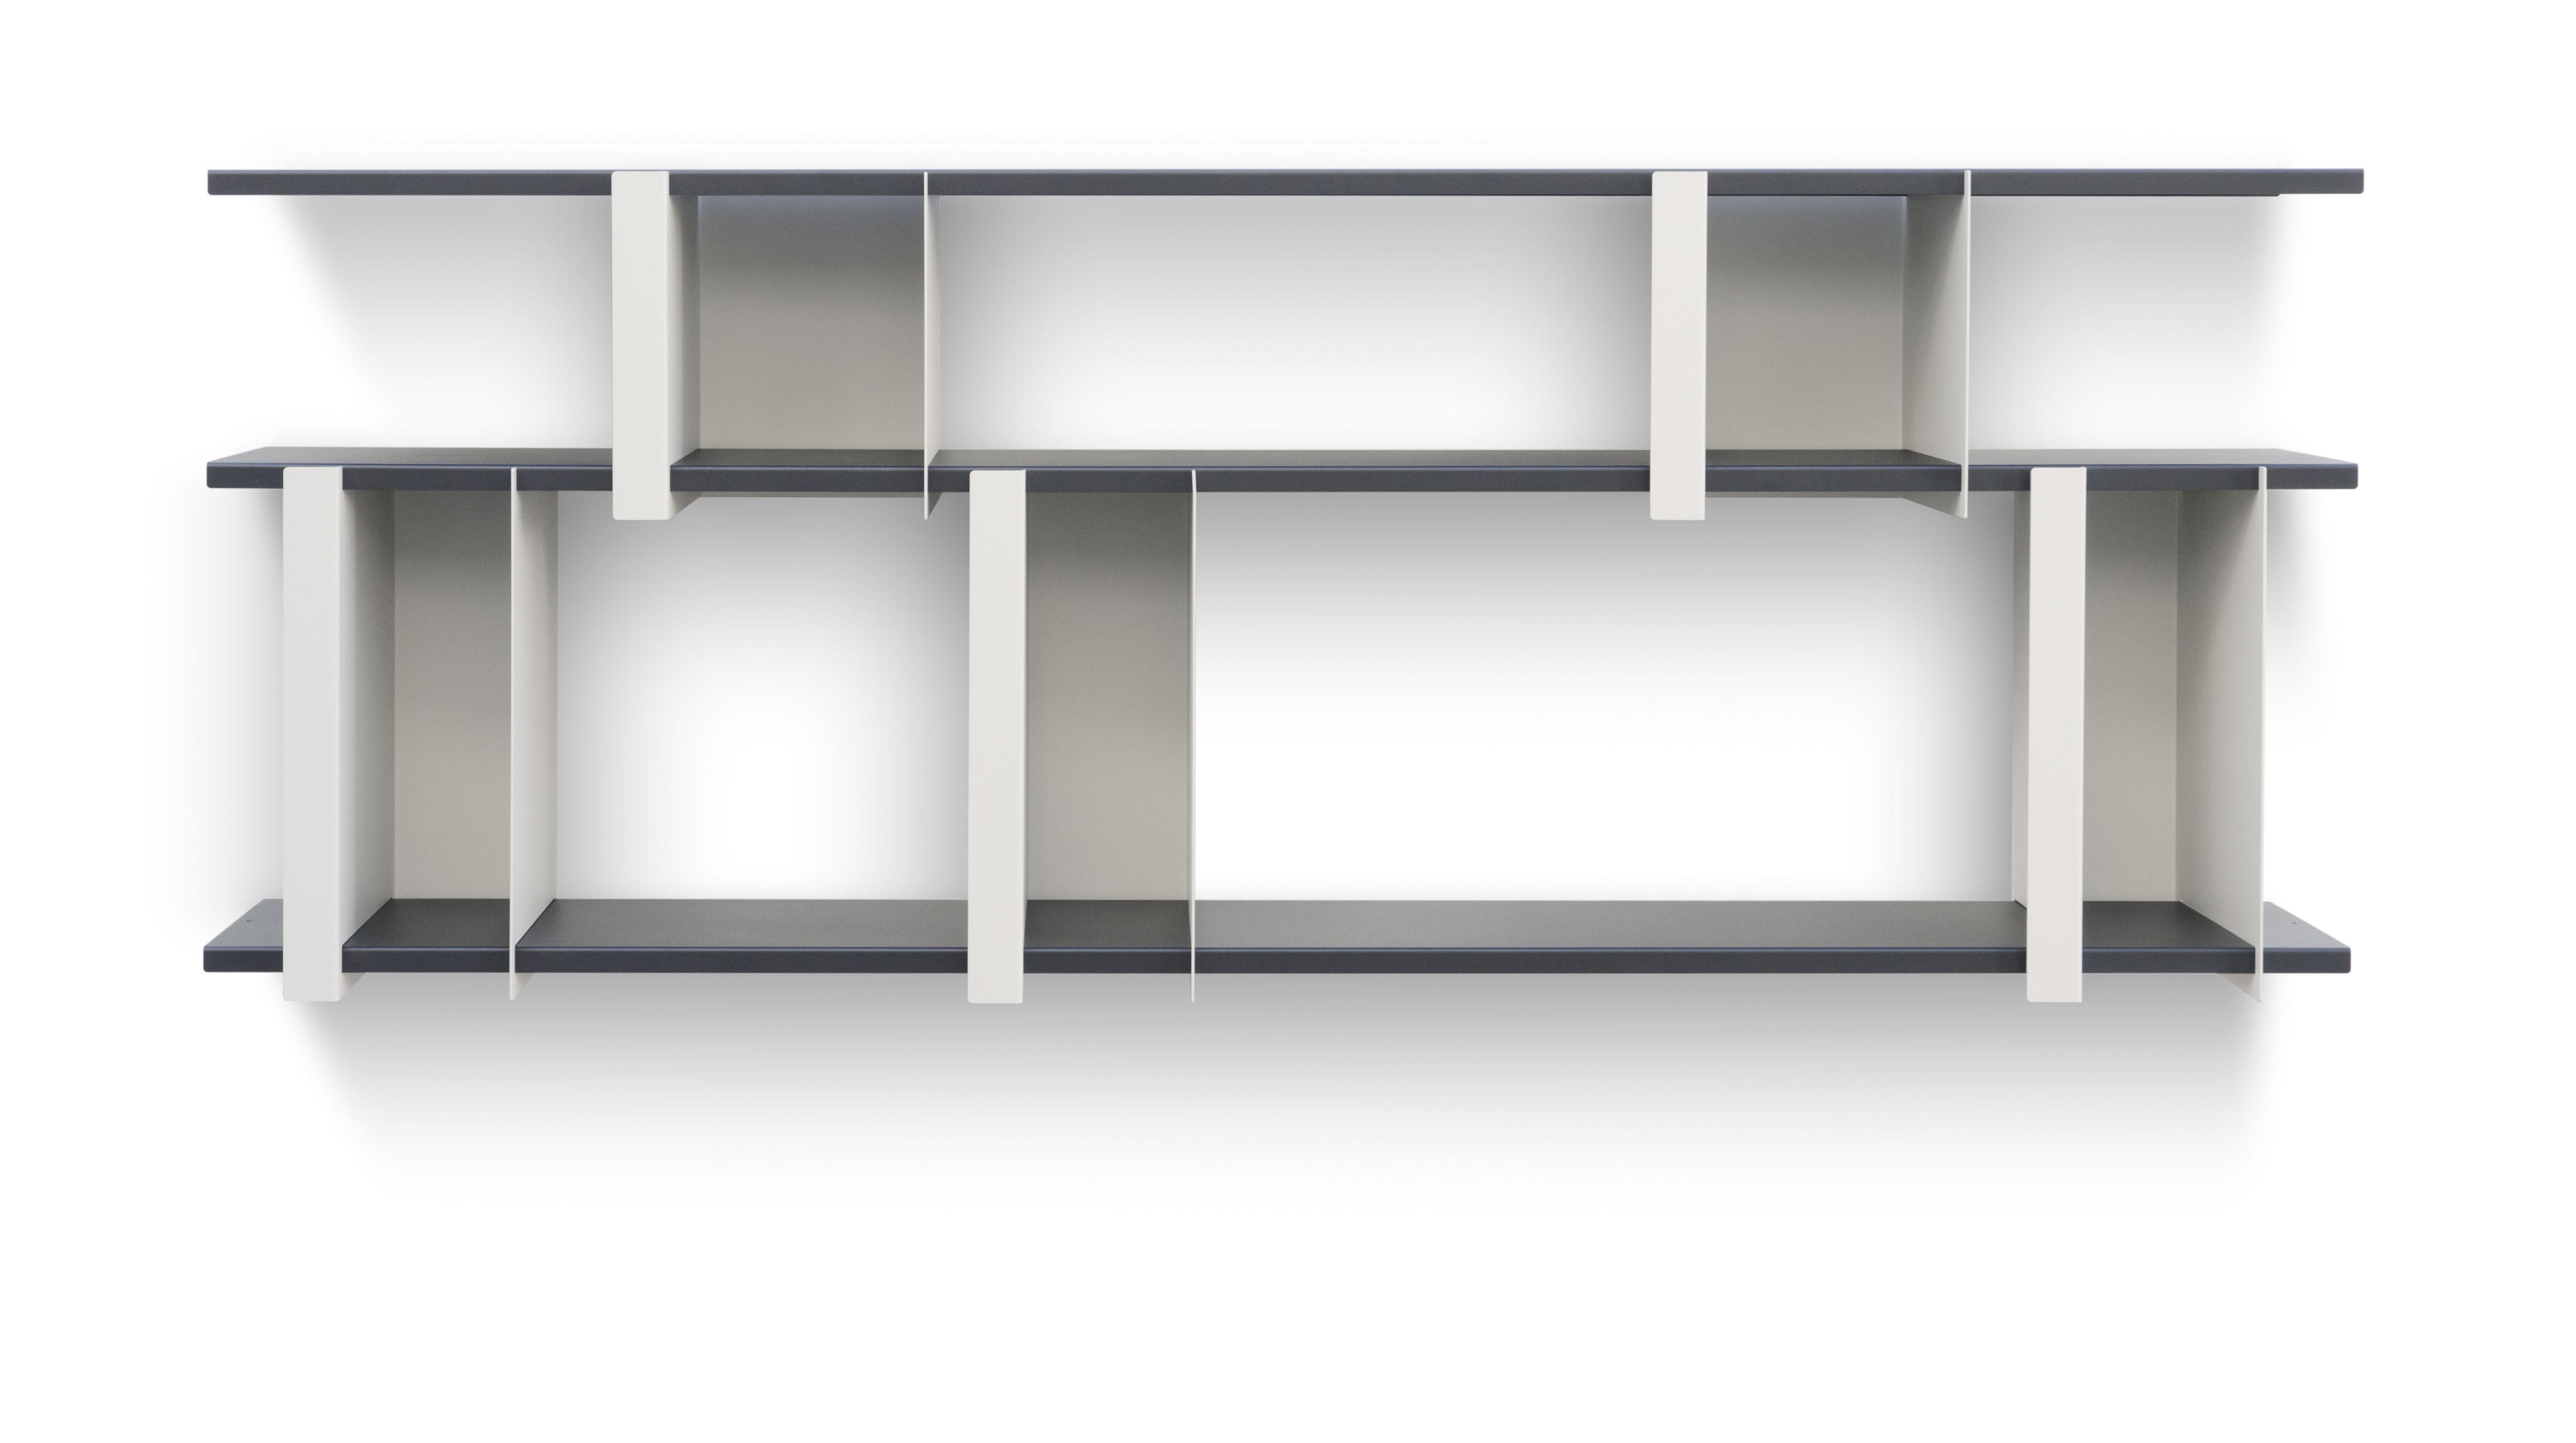 Furniture - Bookcases & Bookshelves - Opli 3 Shelf - / L 149 x H 61 cm by Presse citron - Light beige / Charcoal - Lacquered steel